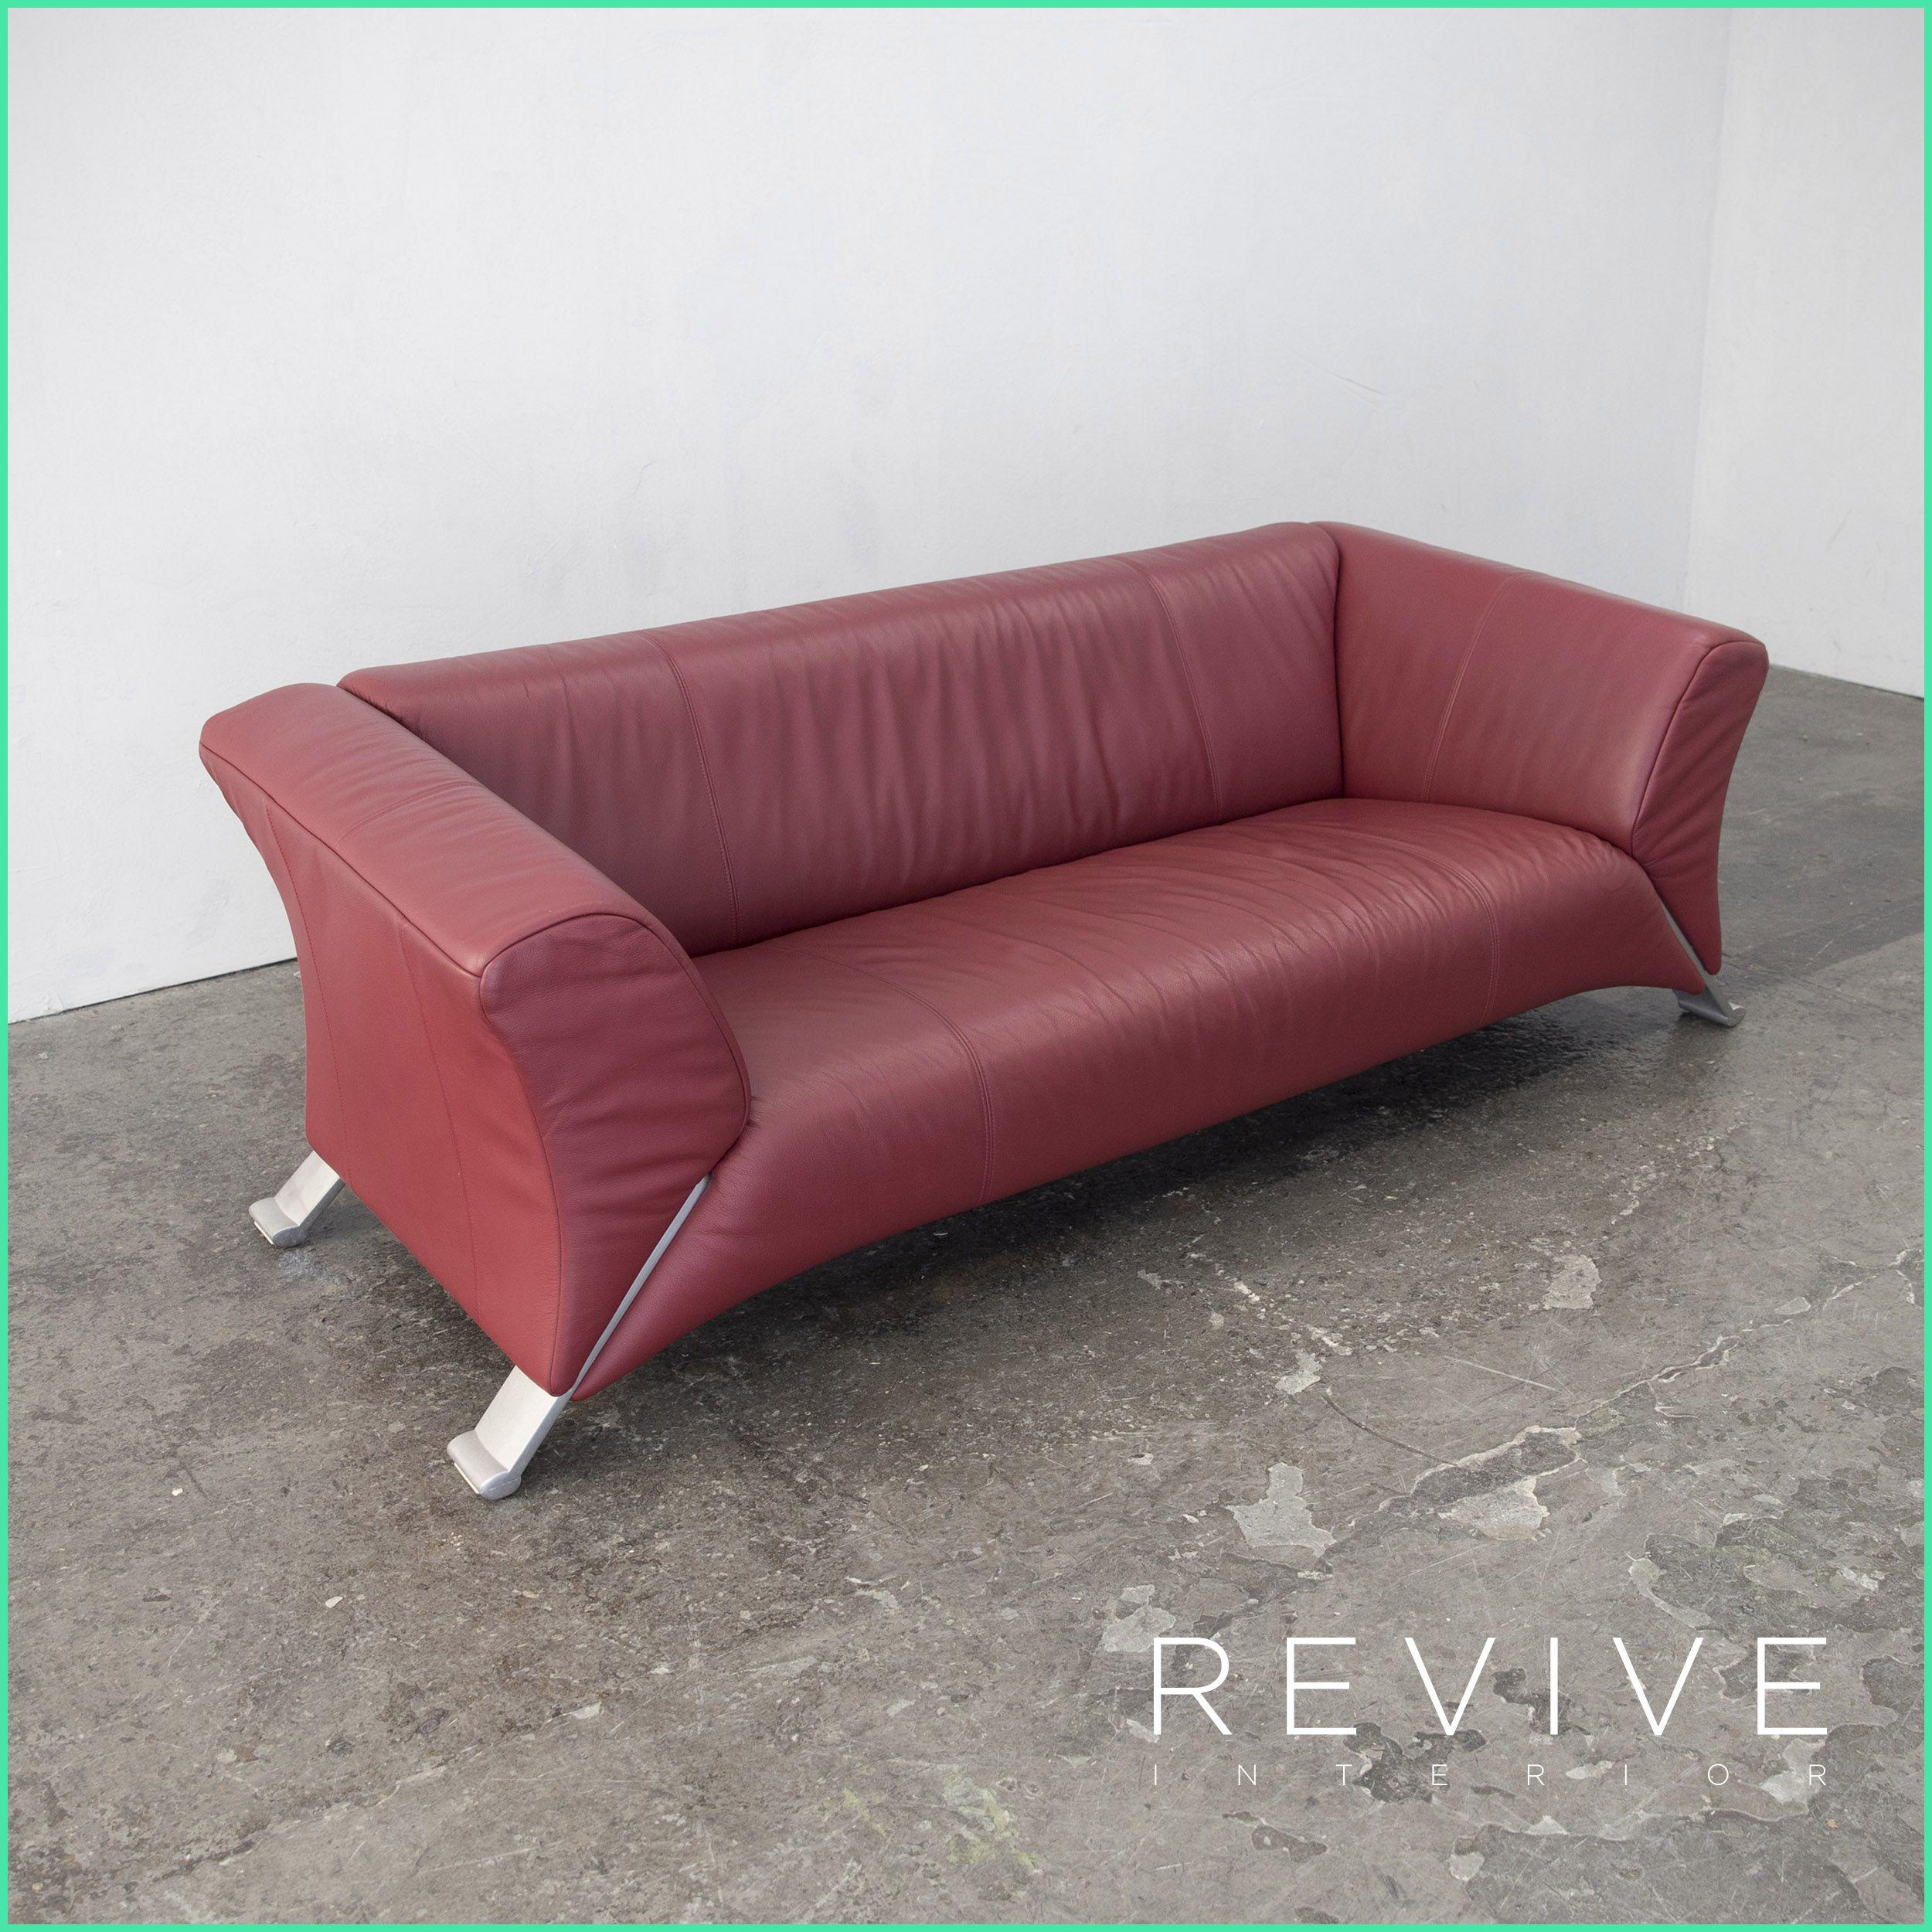 13 Typisch Ledersofa Rot In 2020 Solsta Sofa Bed Sofa Bed Furniture Sofa Bed